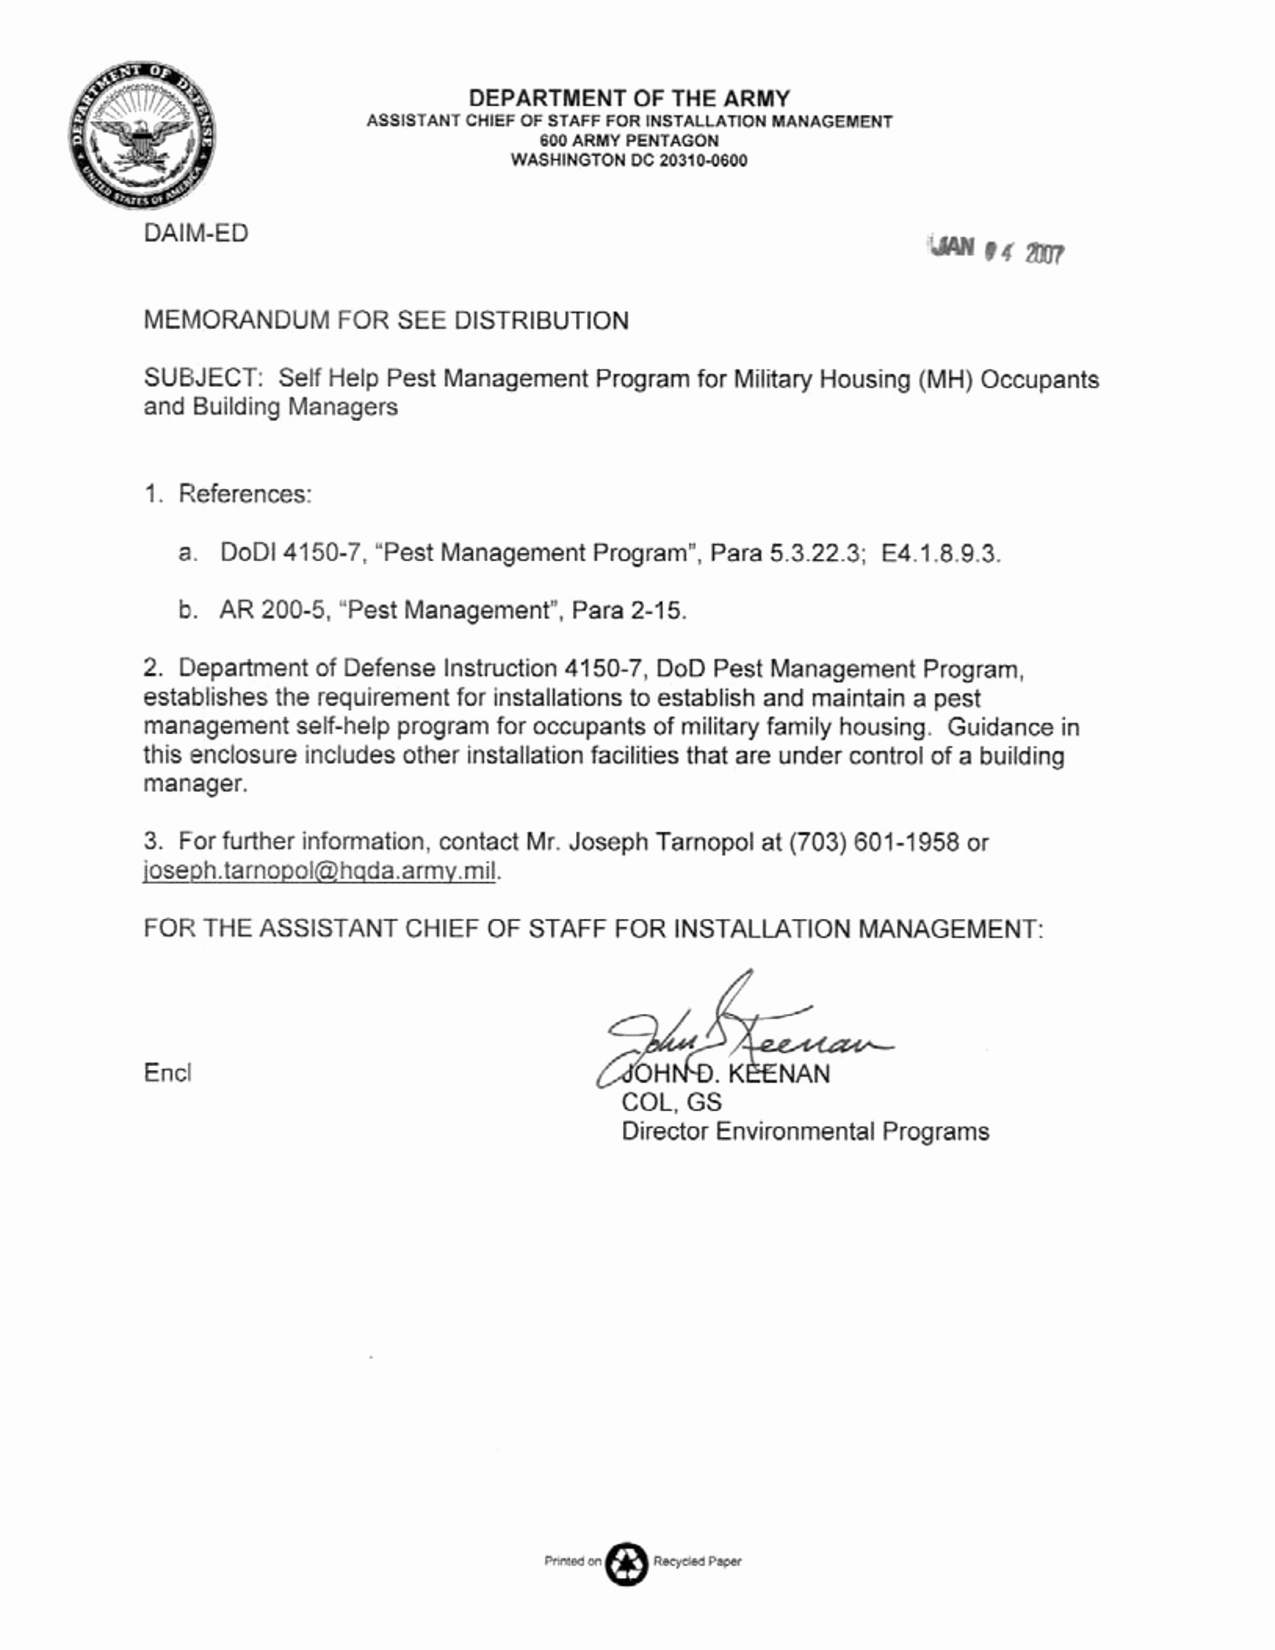 Army Memorandum for Record Template Unique Best S Of Army Memorandum Template Word Example